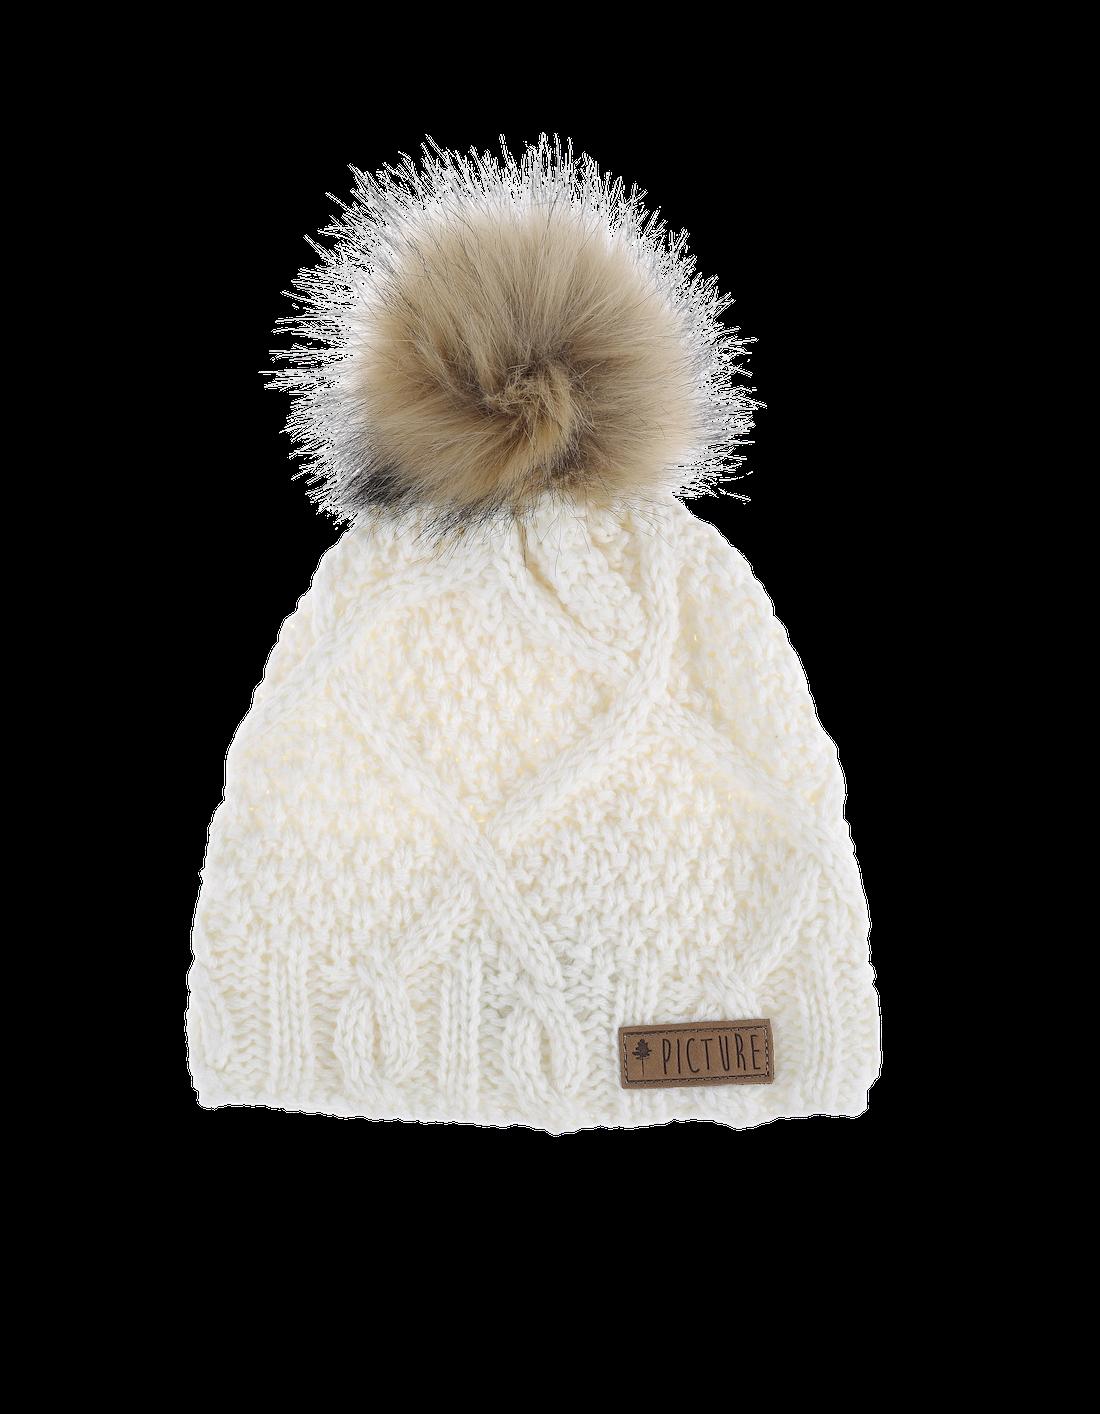 Купить Шапка Picture Organic 2016-17 JUDE D White Головные уборы, шарфы 1306664